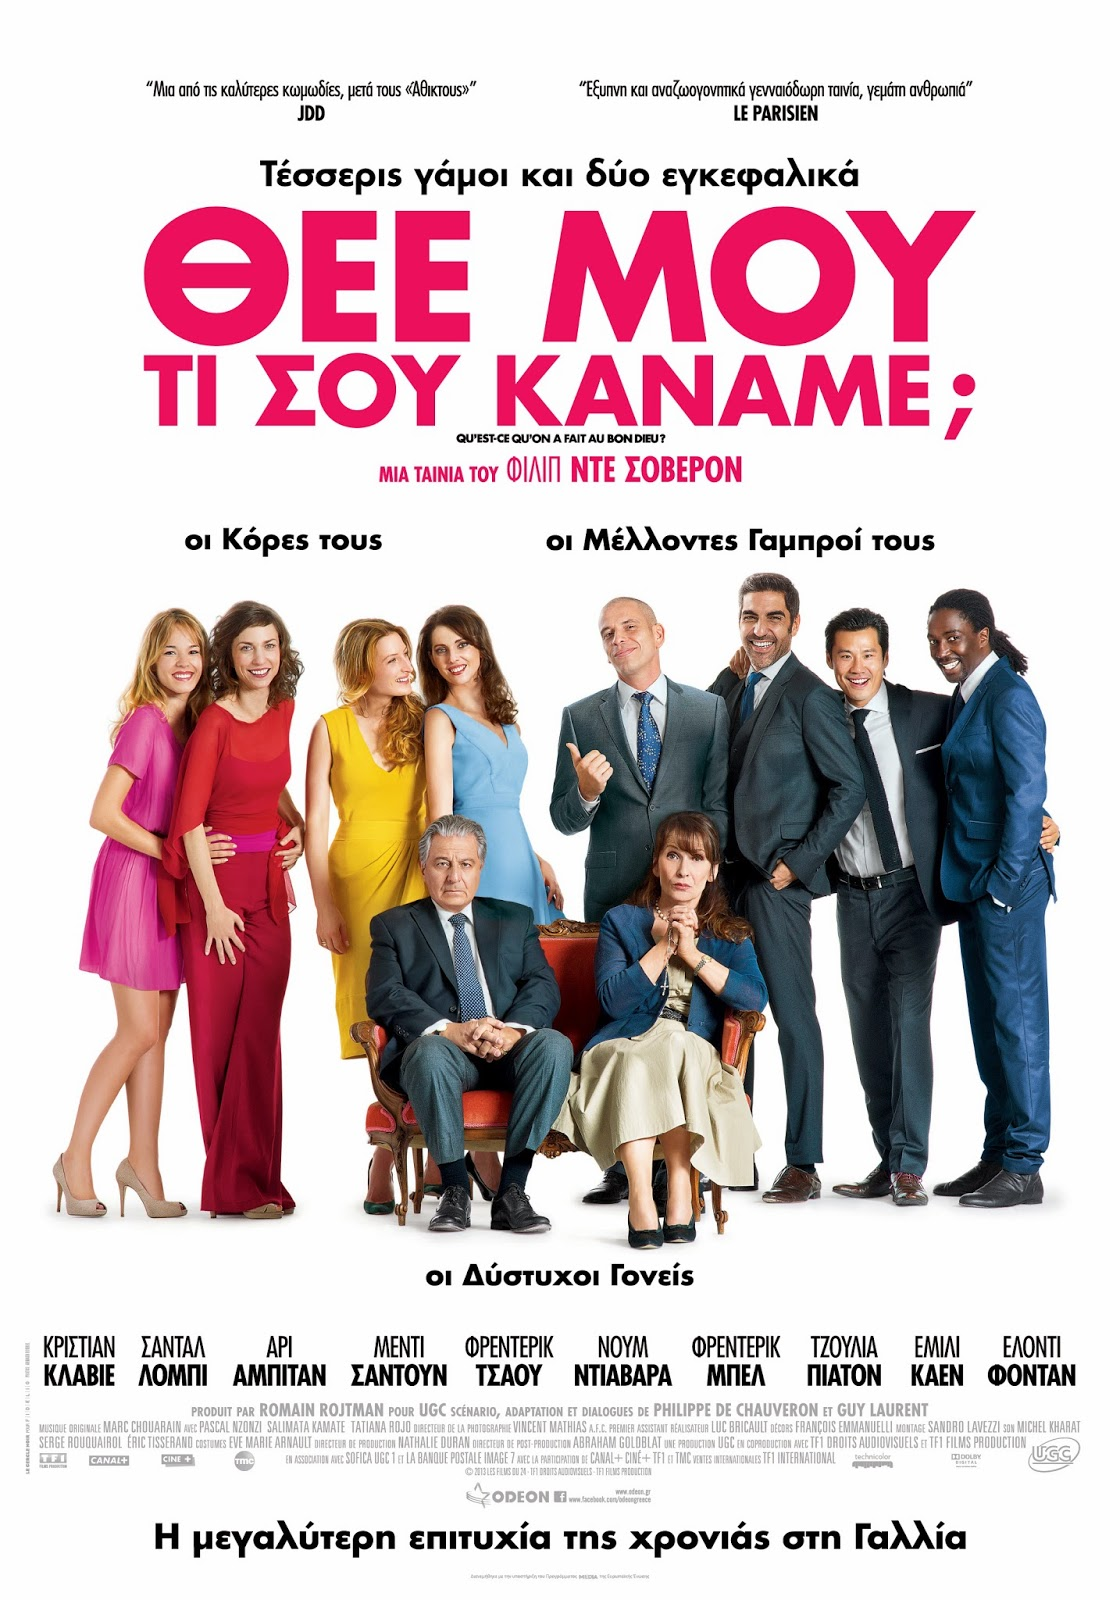 Qu es Ce Qu on A Fait Au Bon Dieu / Θεέ μου τι σου κάναμε (2014) DVDRIP ταινιες online seires xrysoi greek subs